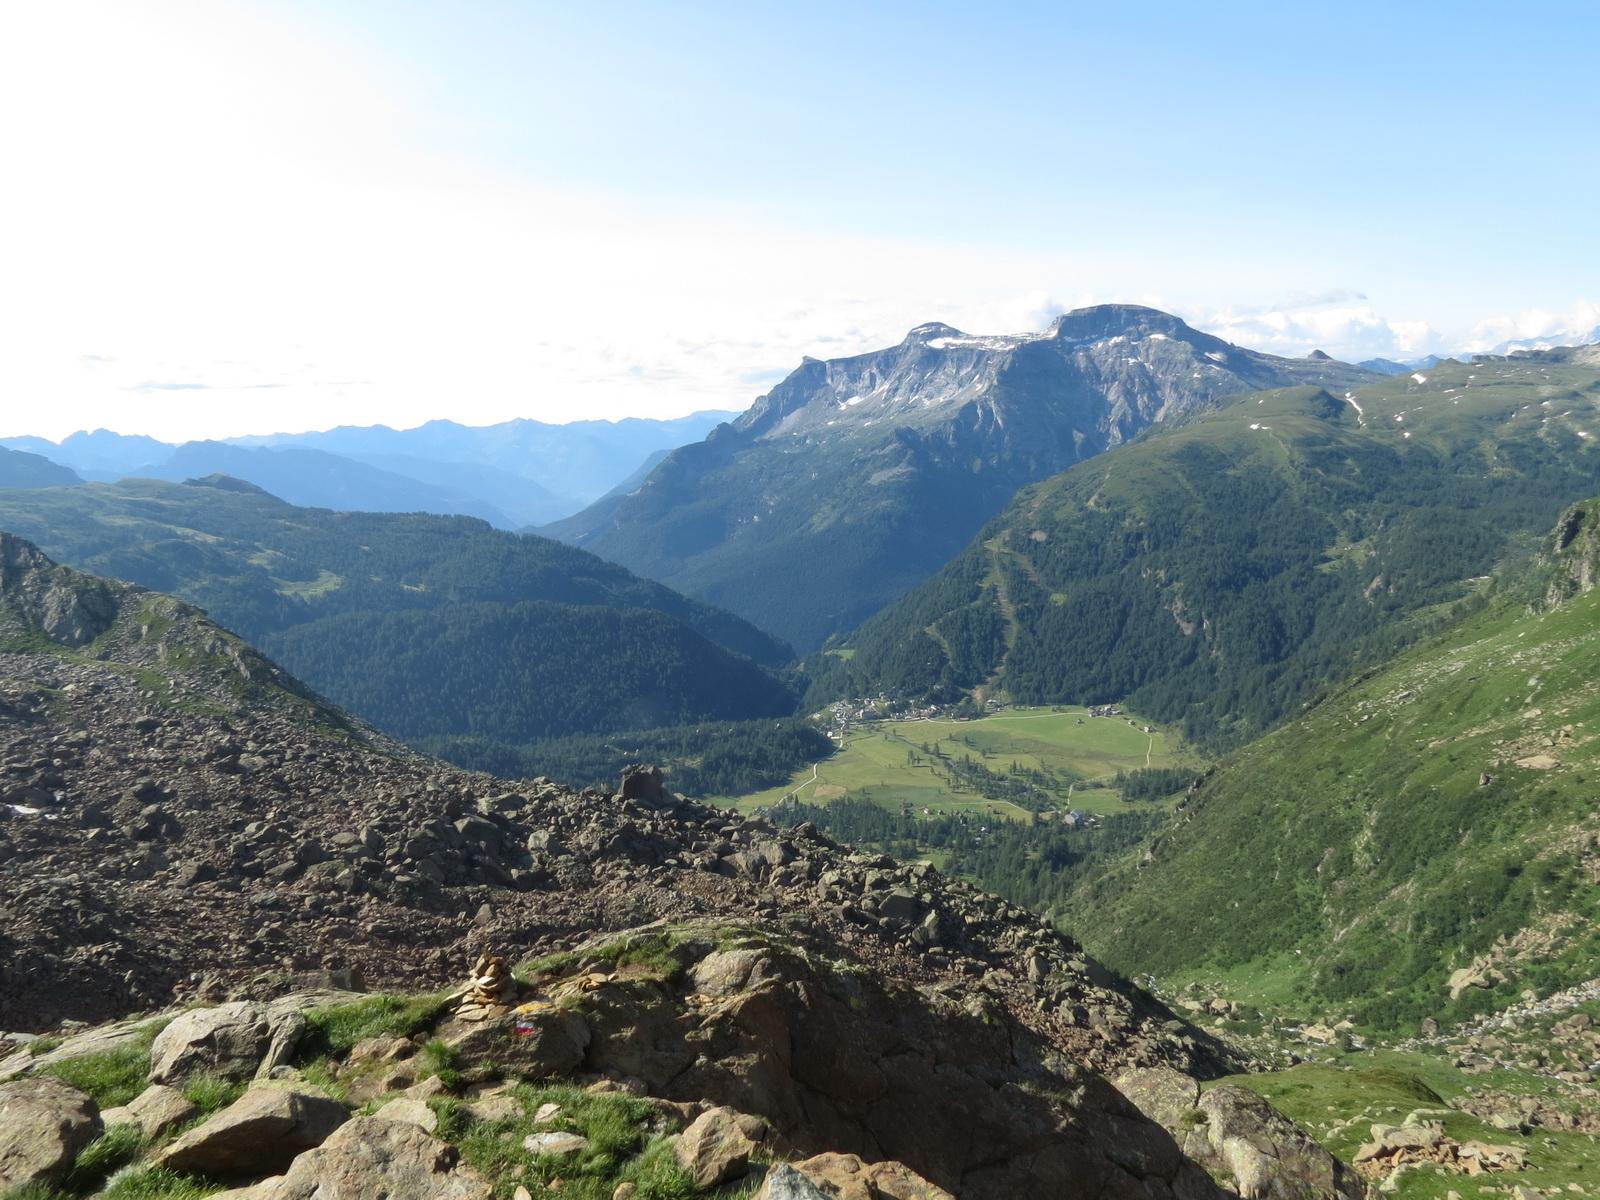 Binntal et sa région août 2013